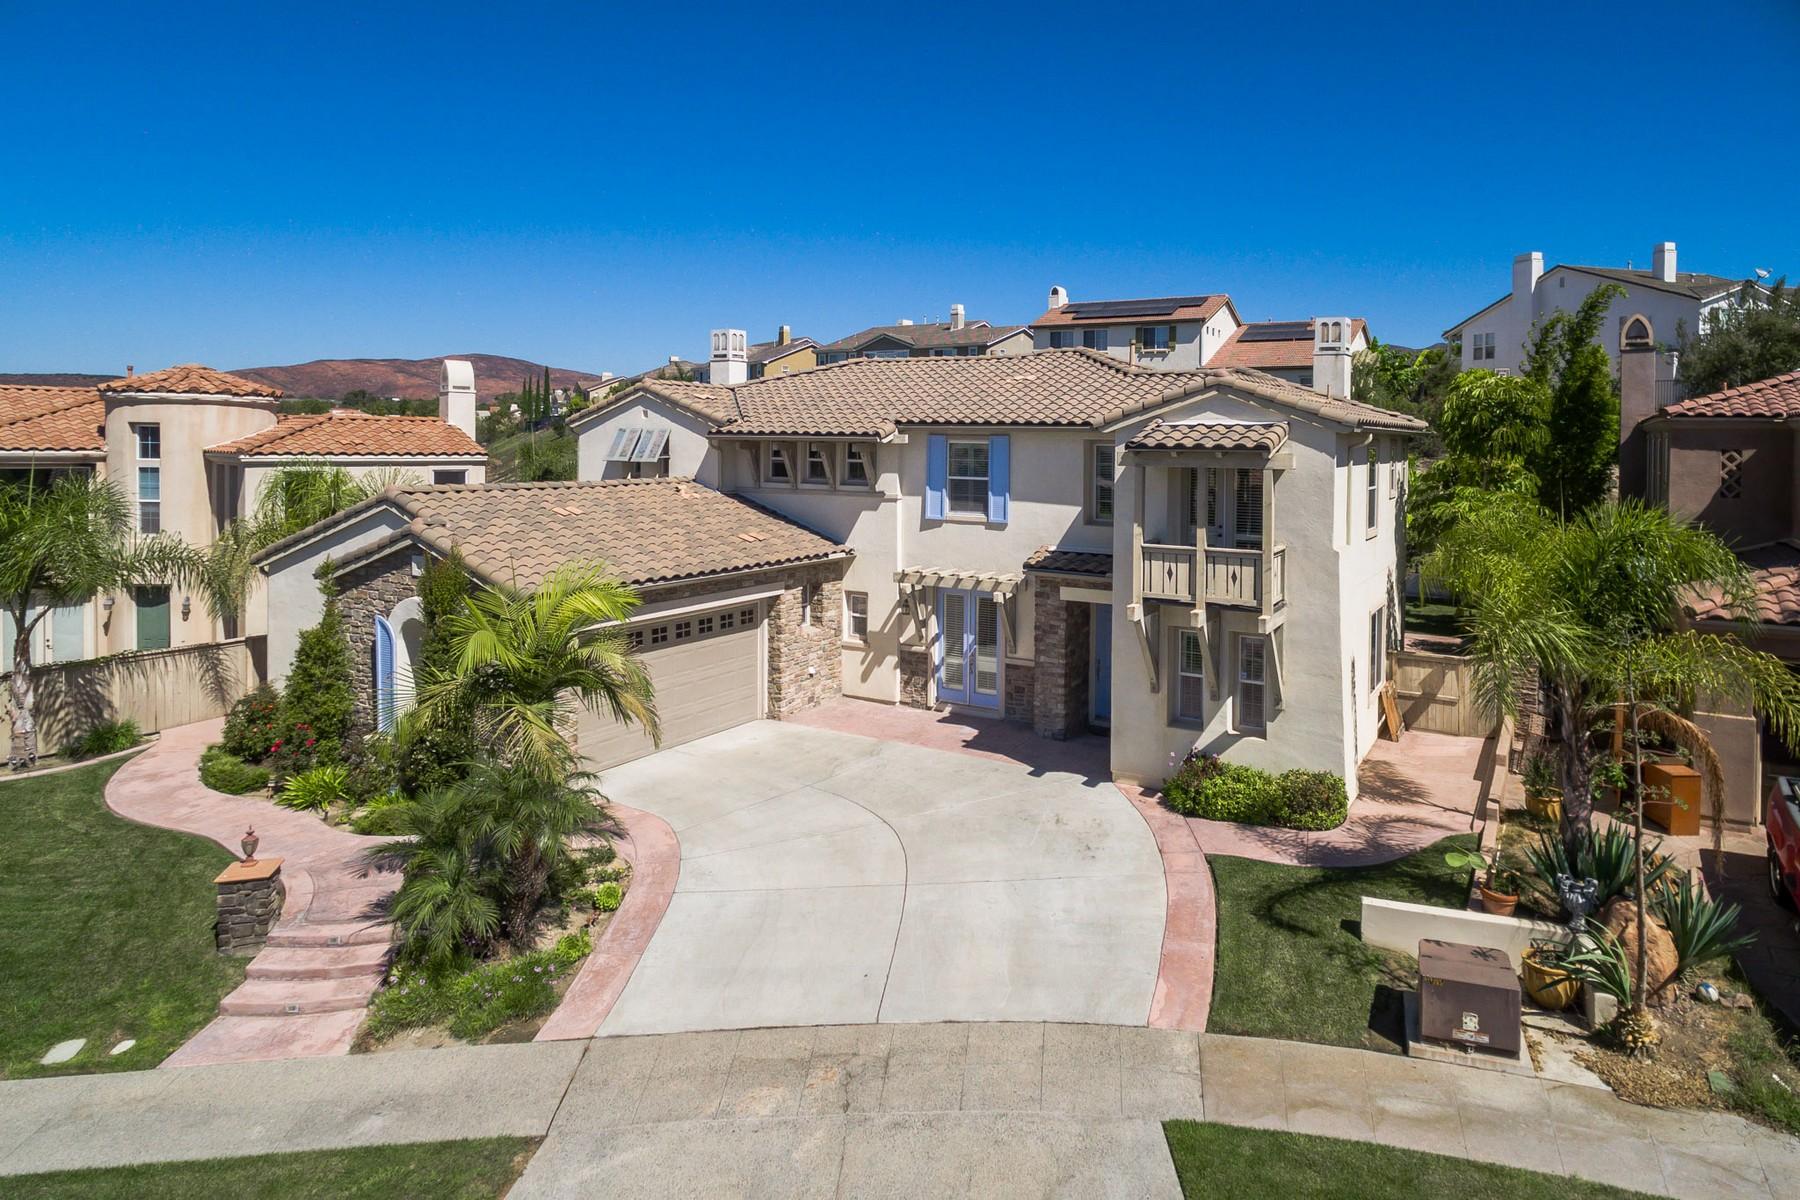 Single Family Home for Sale at 1037 White Alder Avenue Chula Vista, California 91914 United States